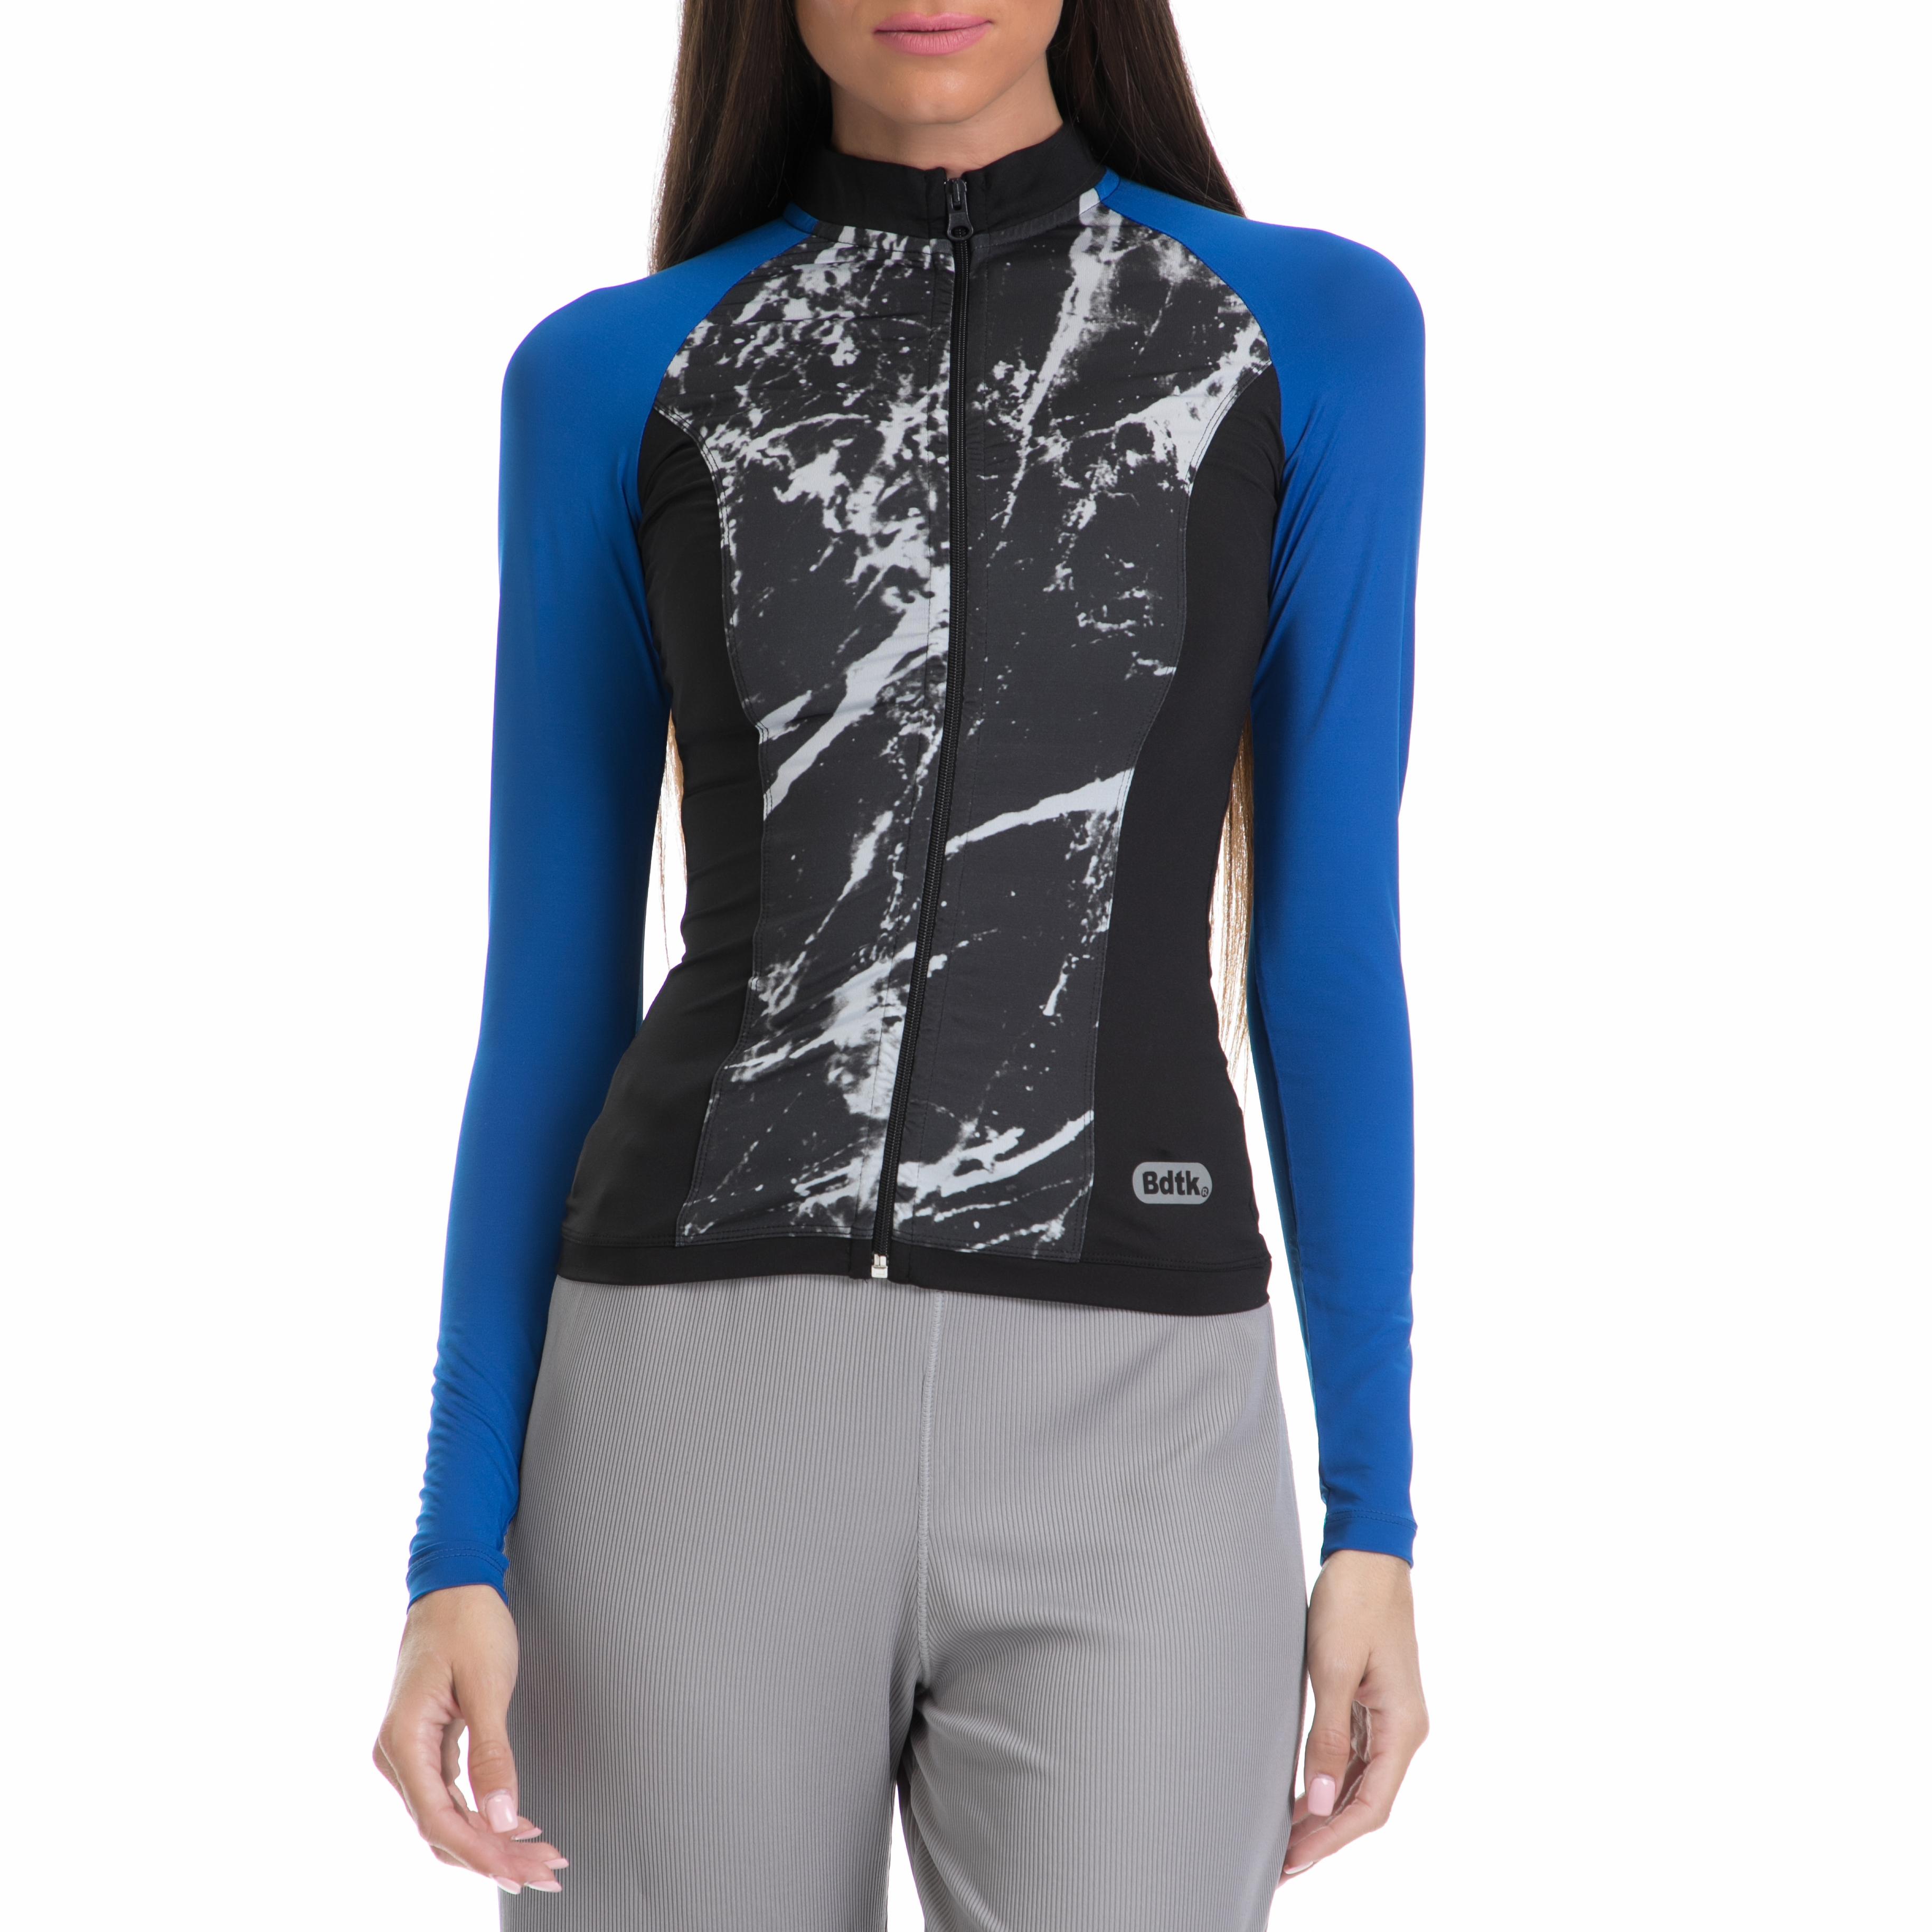 BODYTALK - Γυναικεία ζακέτα BODYTALK μπλε-μαύρη γυναικεία ρούχα αθλητικά φούτερ μακρυμάνικα